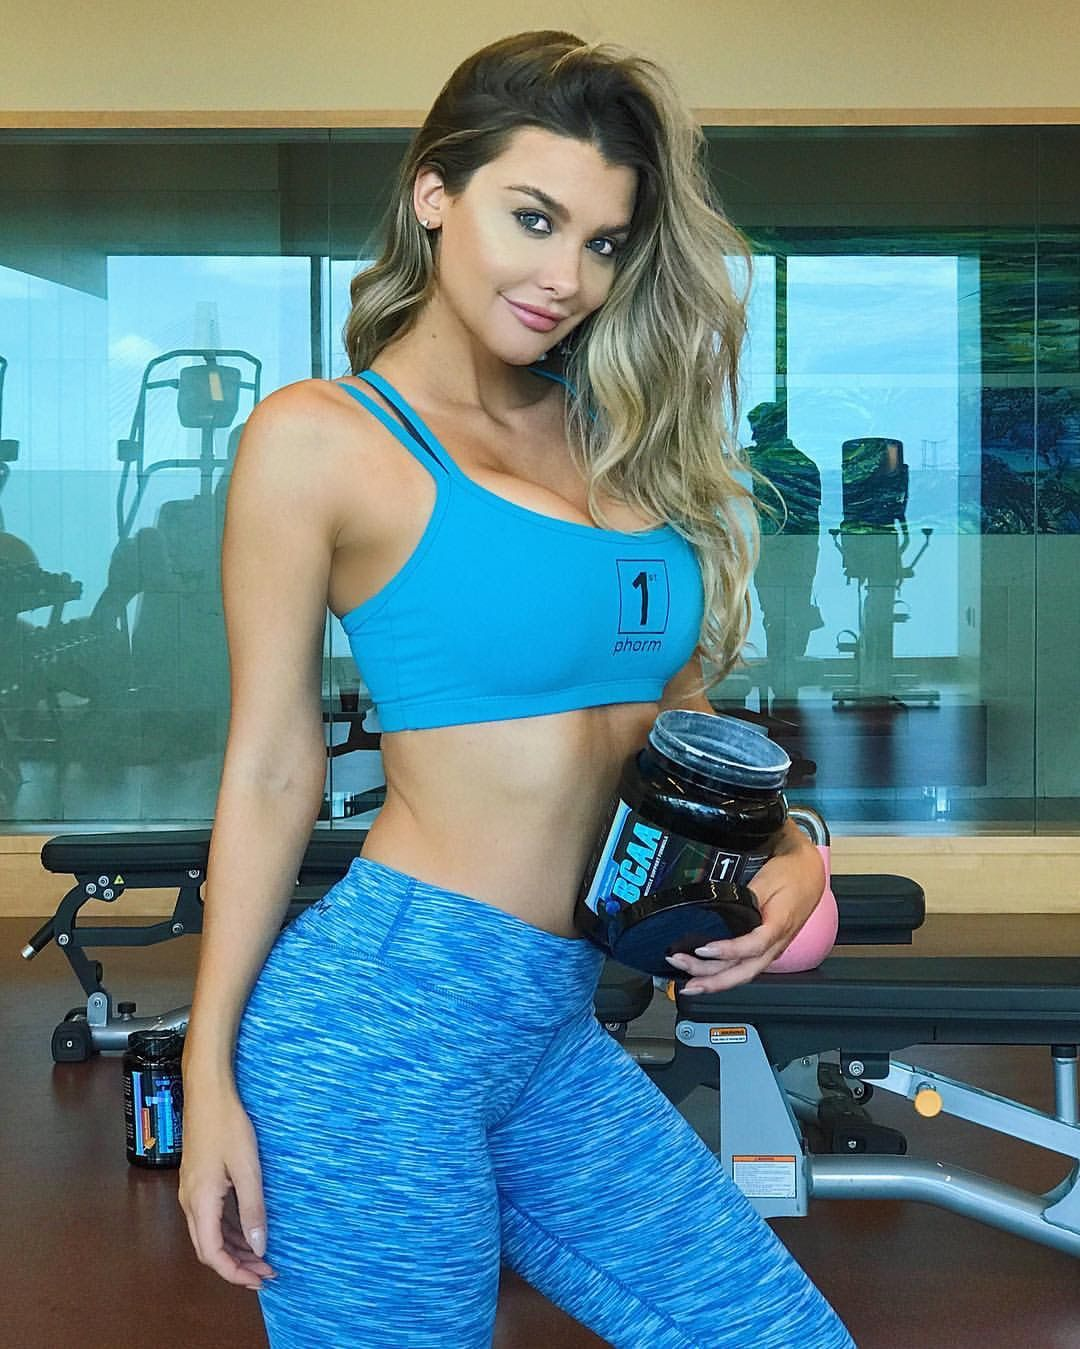 Emily Sears | Emily Sears | Pinterest | Active wear, Yoga pants ...